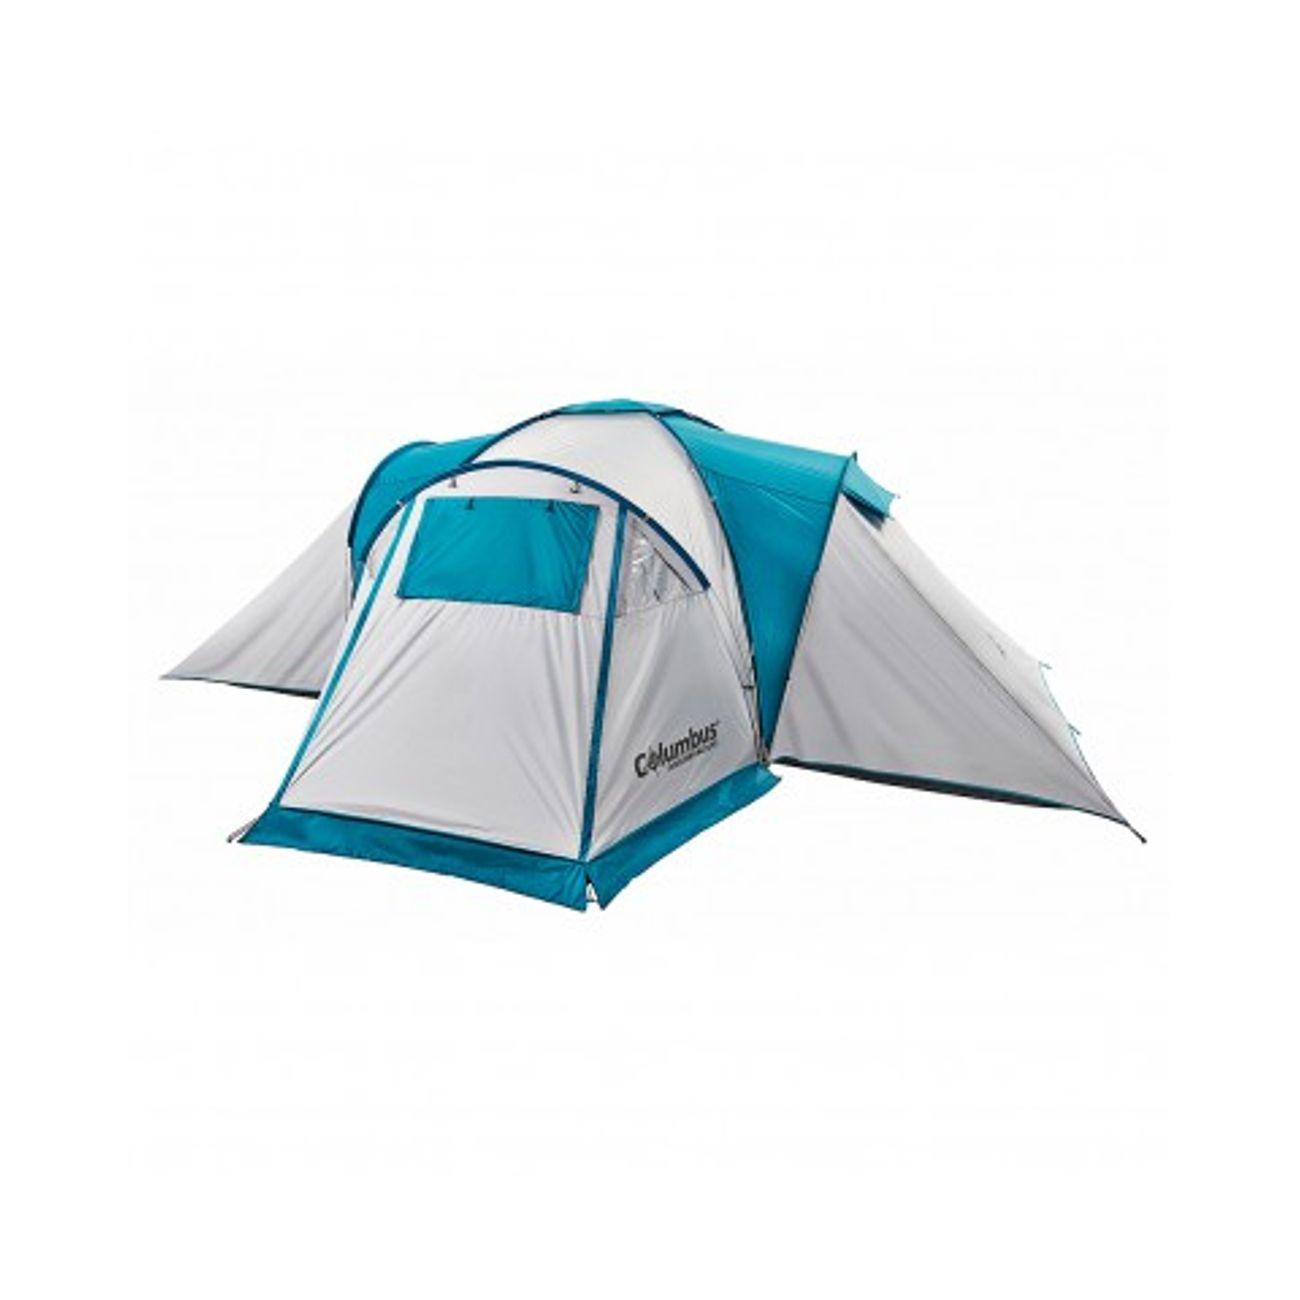 Camping  COLUMBUS COMO 6